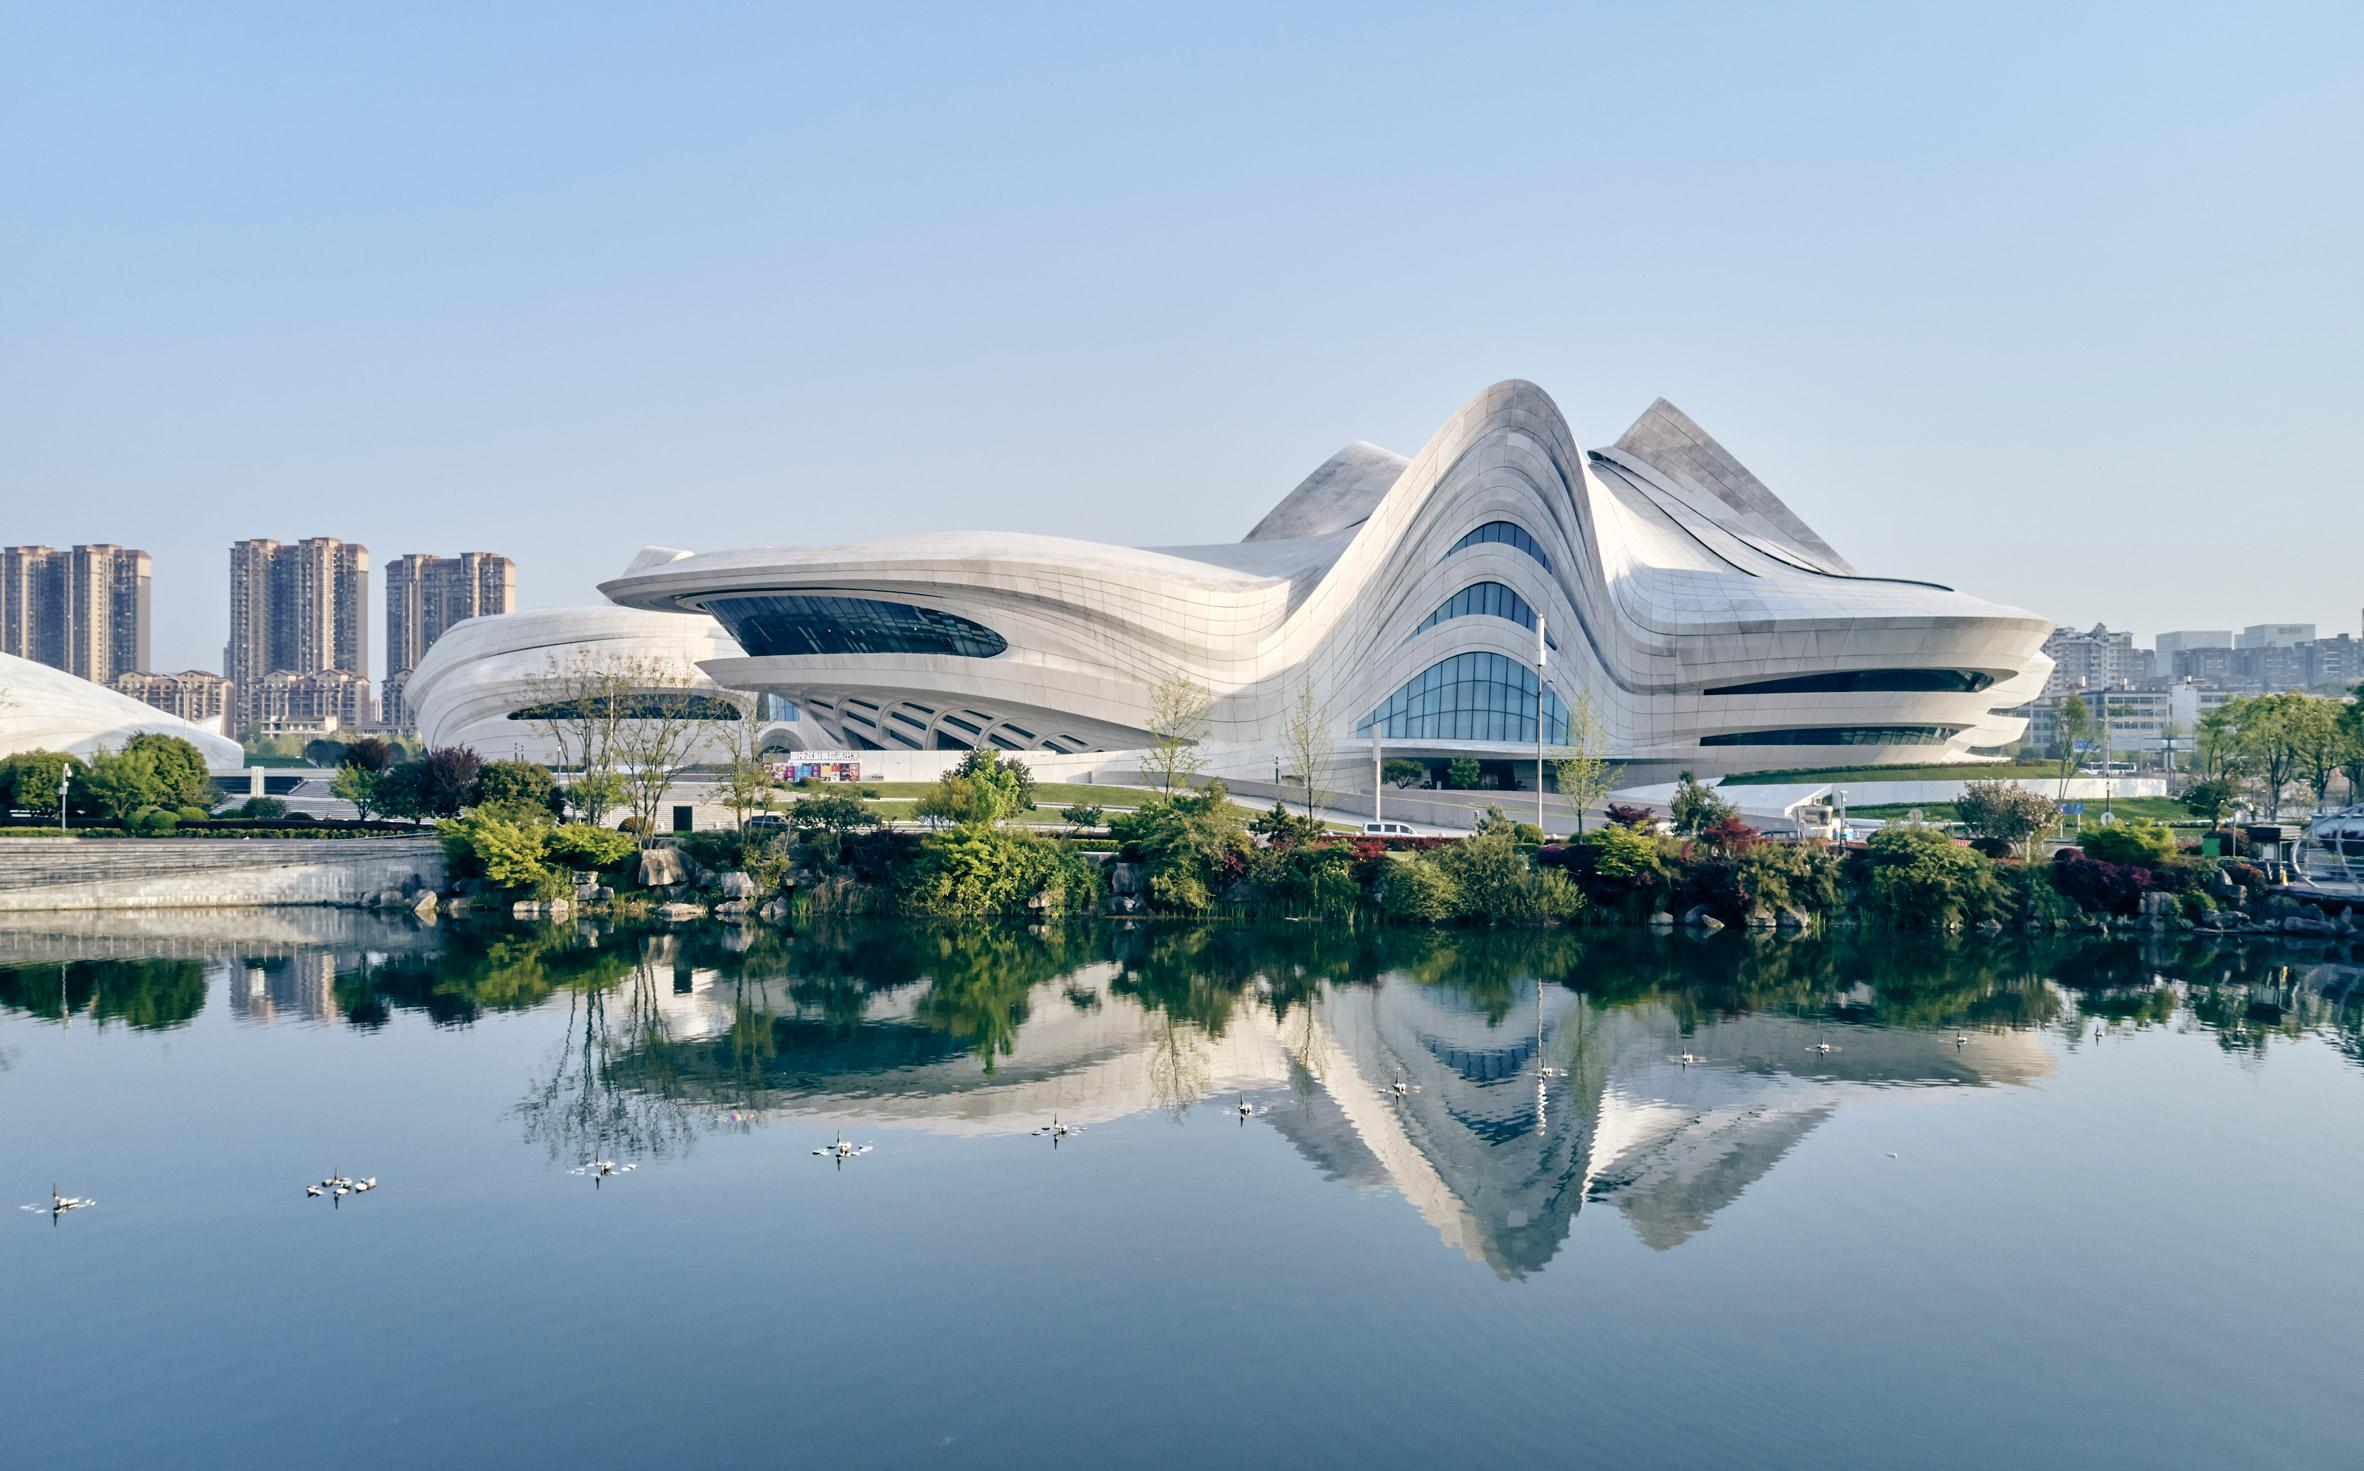 changsha-meixihu-international-culture-art-centre-zaha-hadid-architecture-china_dezeen_2364_col_26